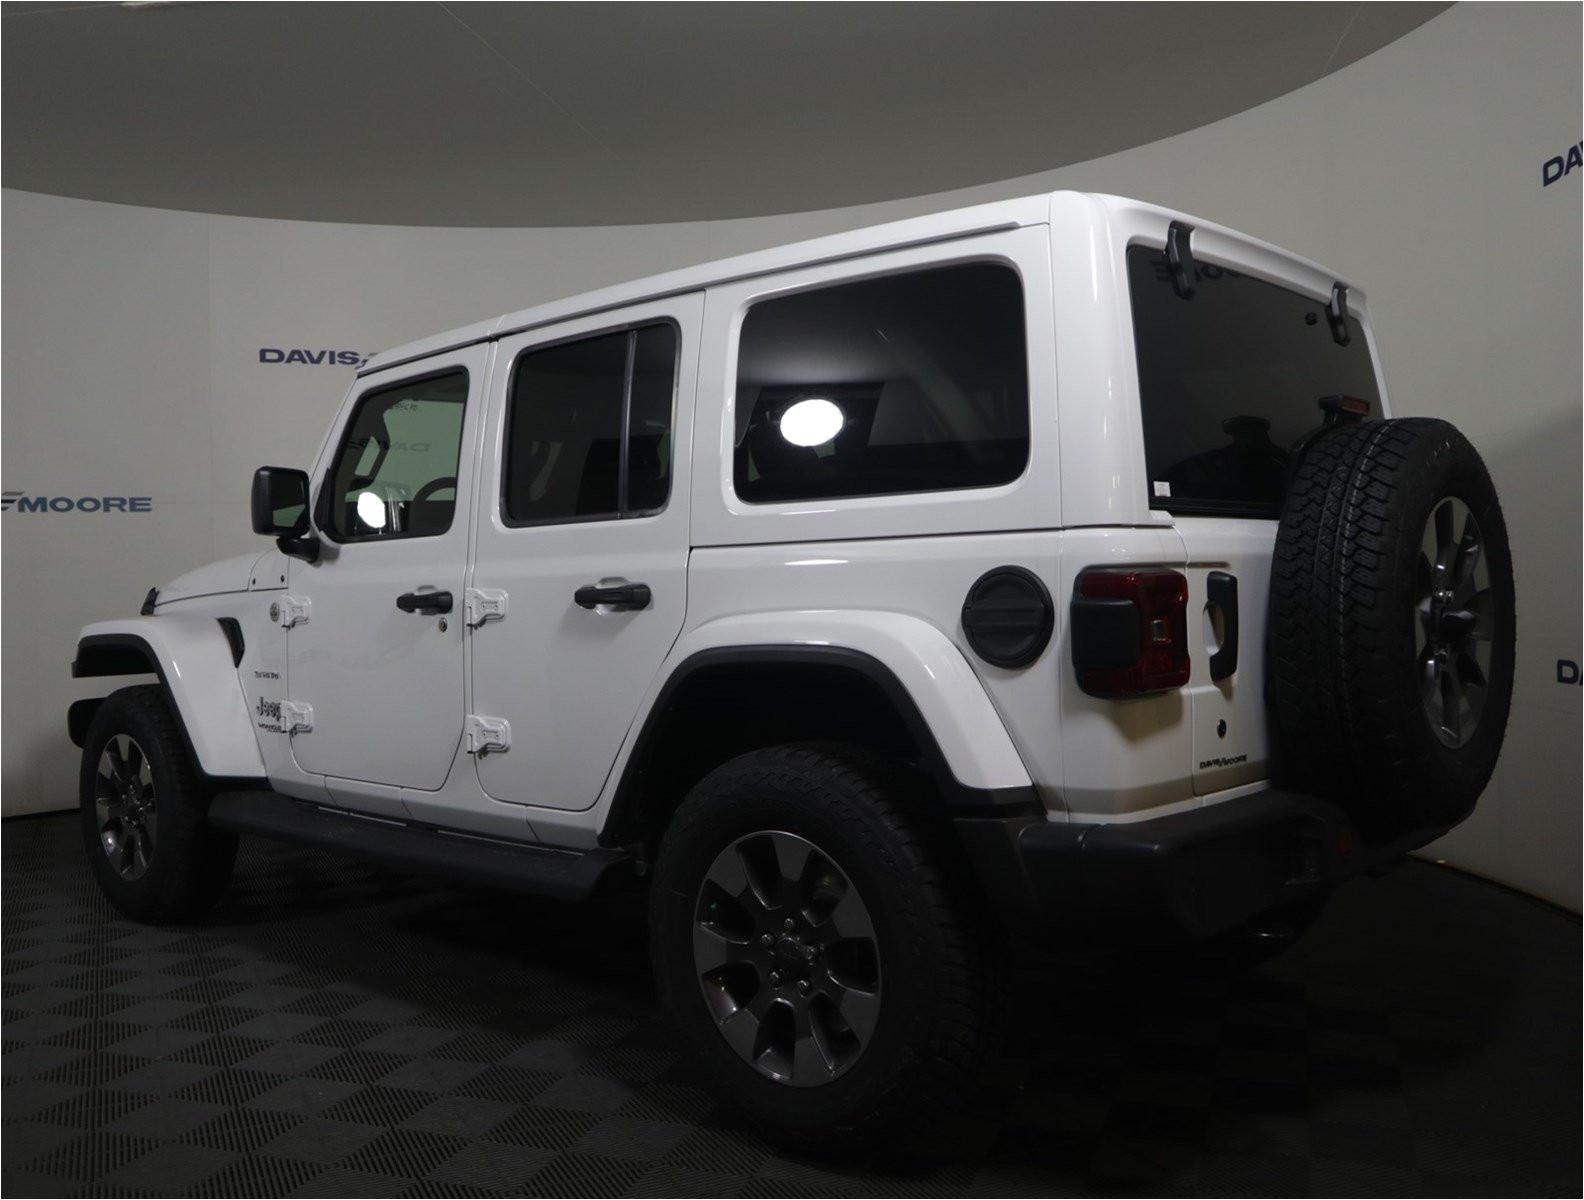 2019 jeep wrangler unlimited sahara in wichita ks davis moore auto group